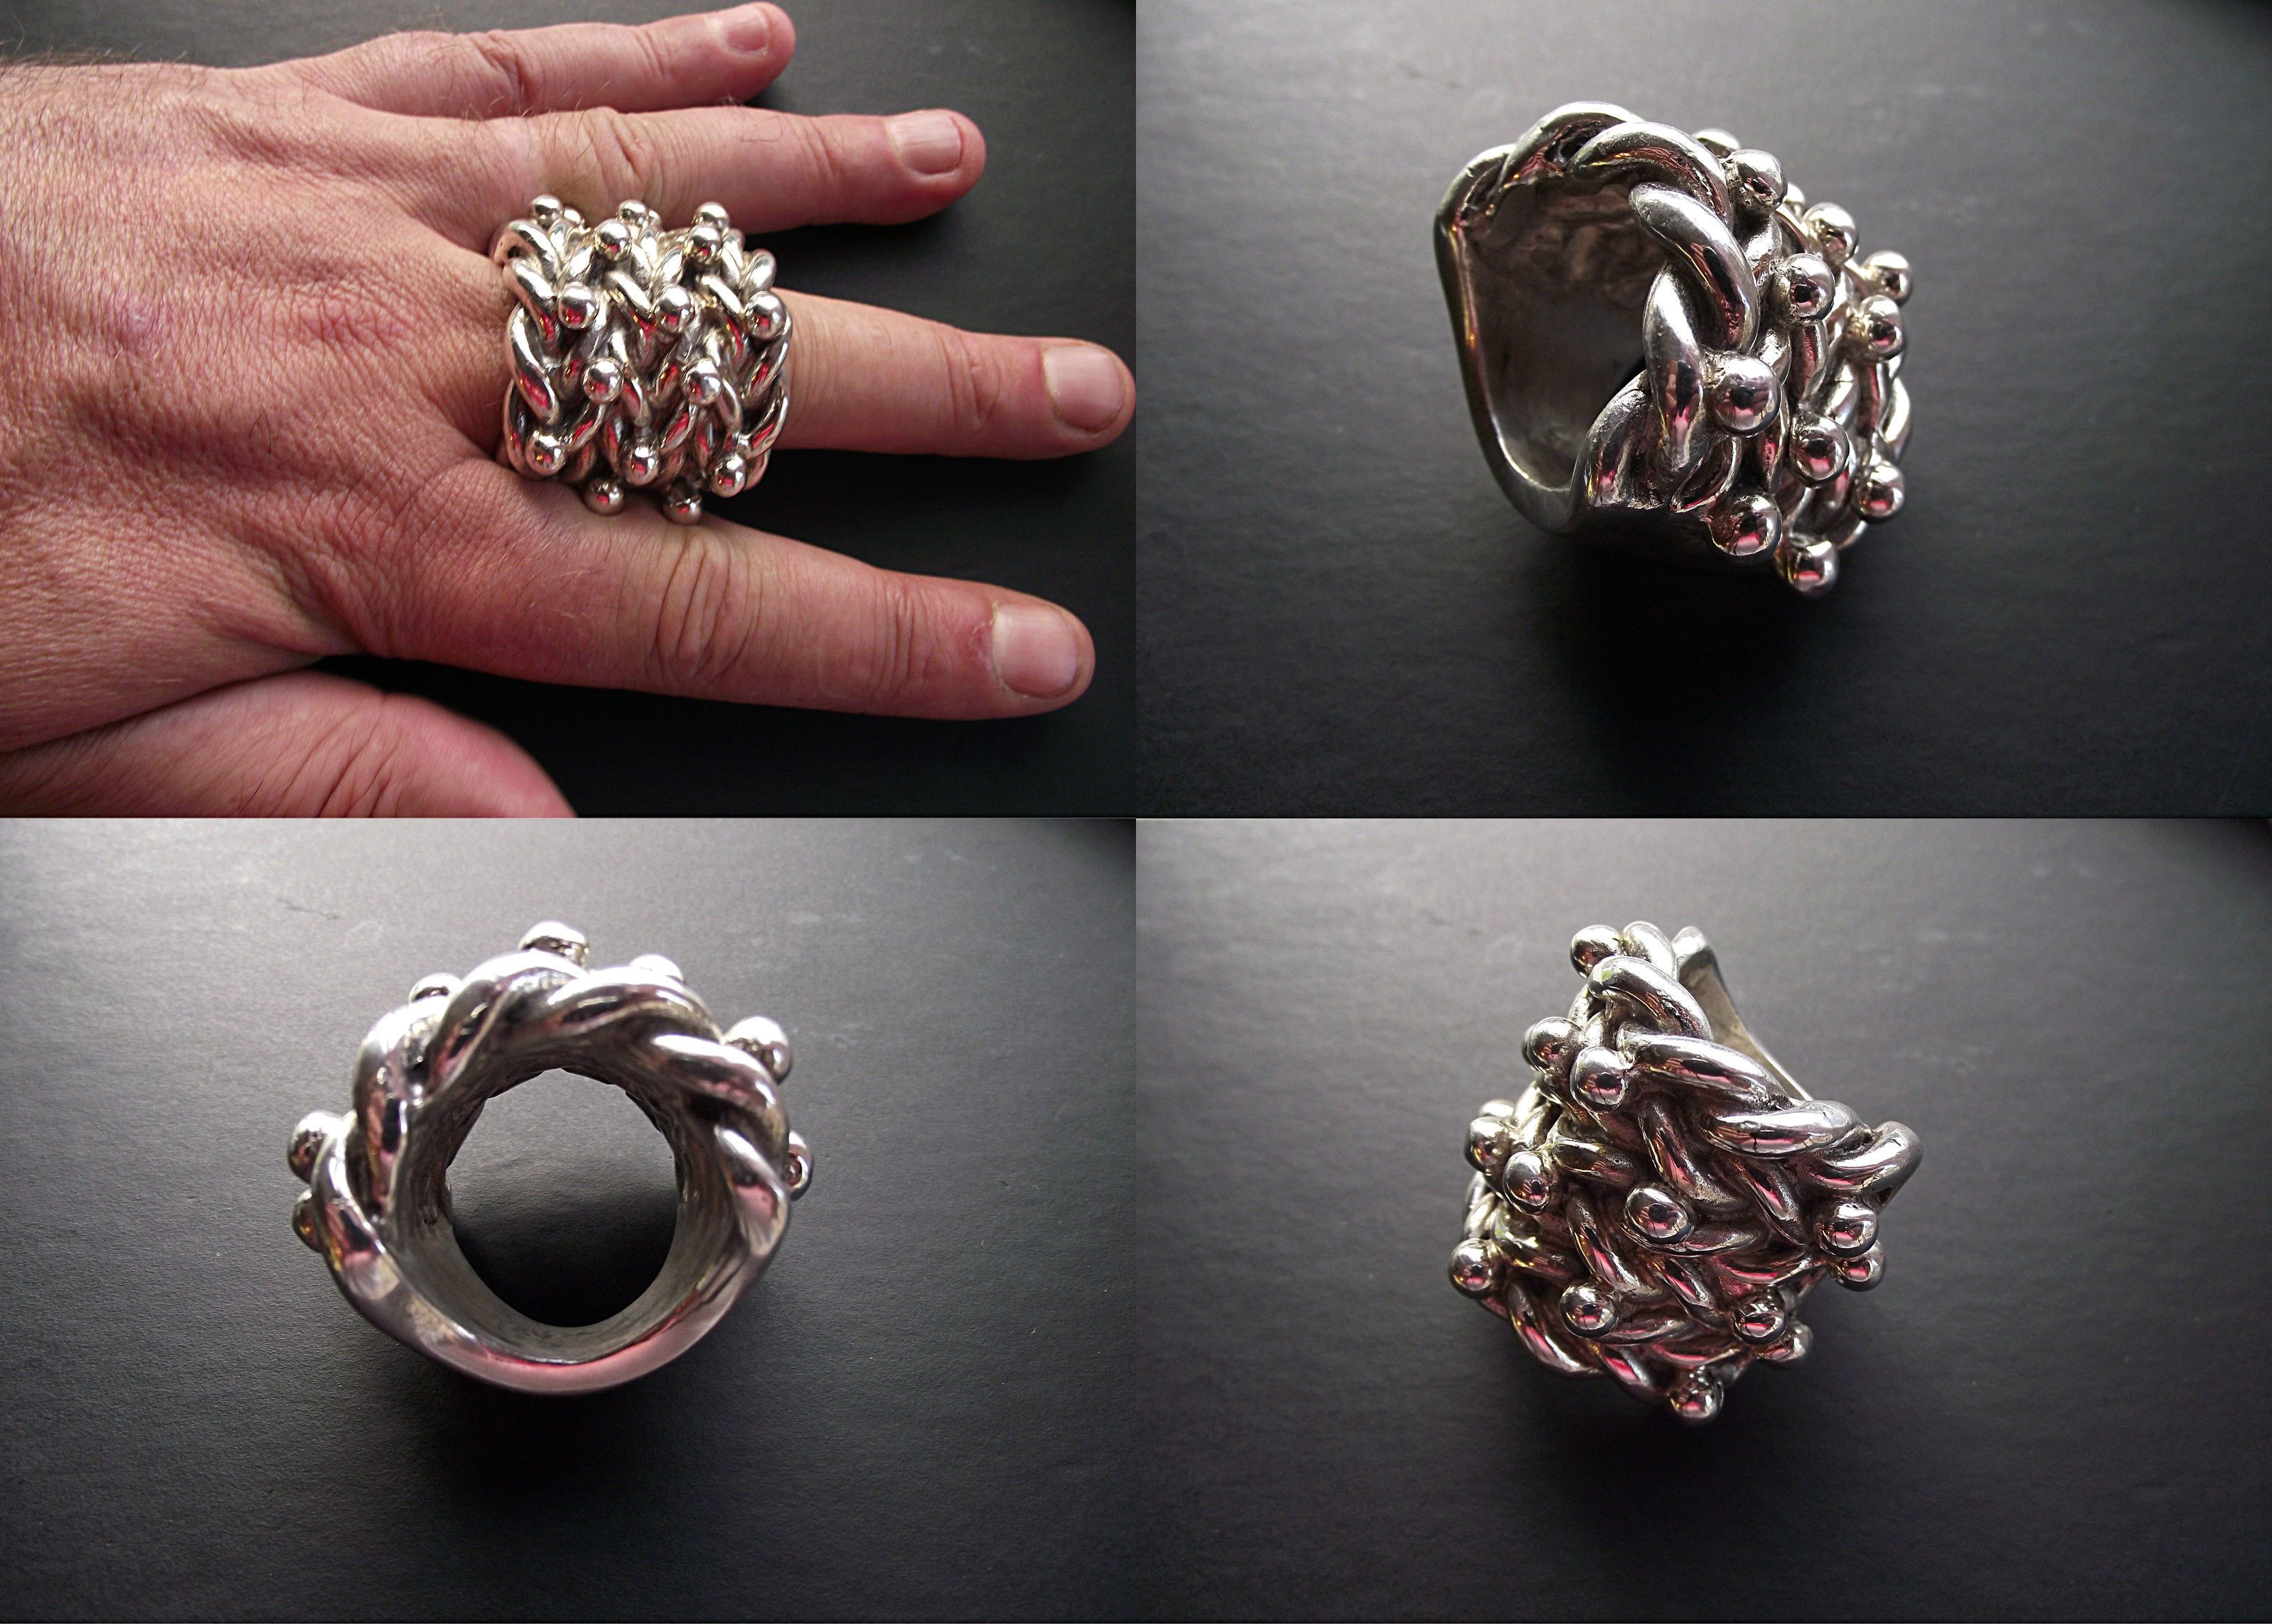 Heavy 925 Silver 4 Row Keeper Ring!